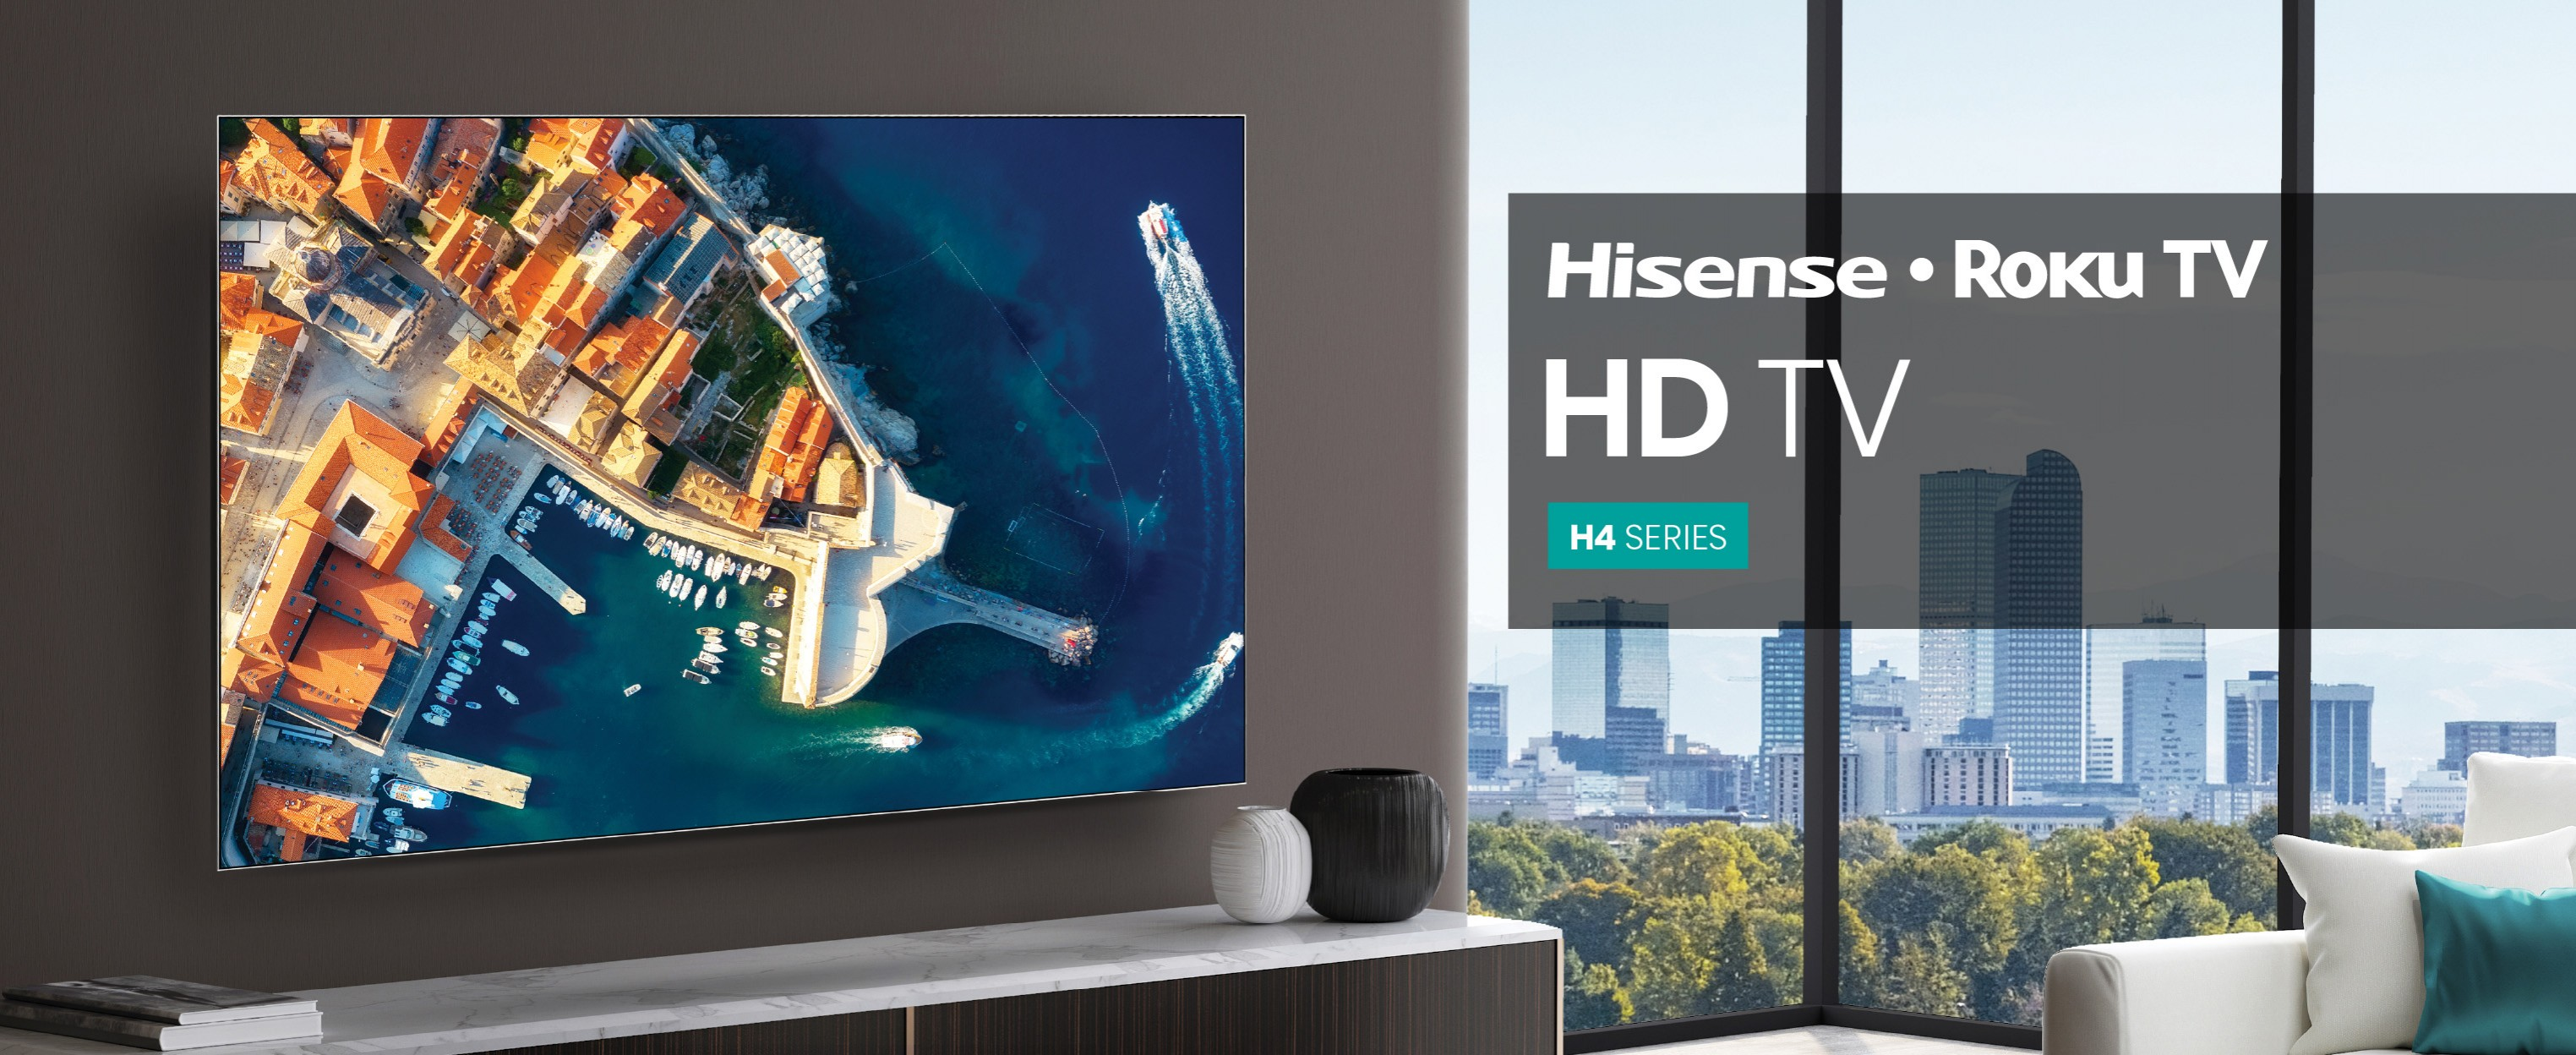 Hisense Roku TV HDTV